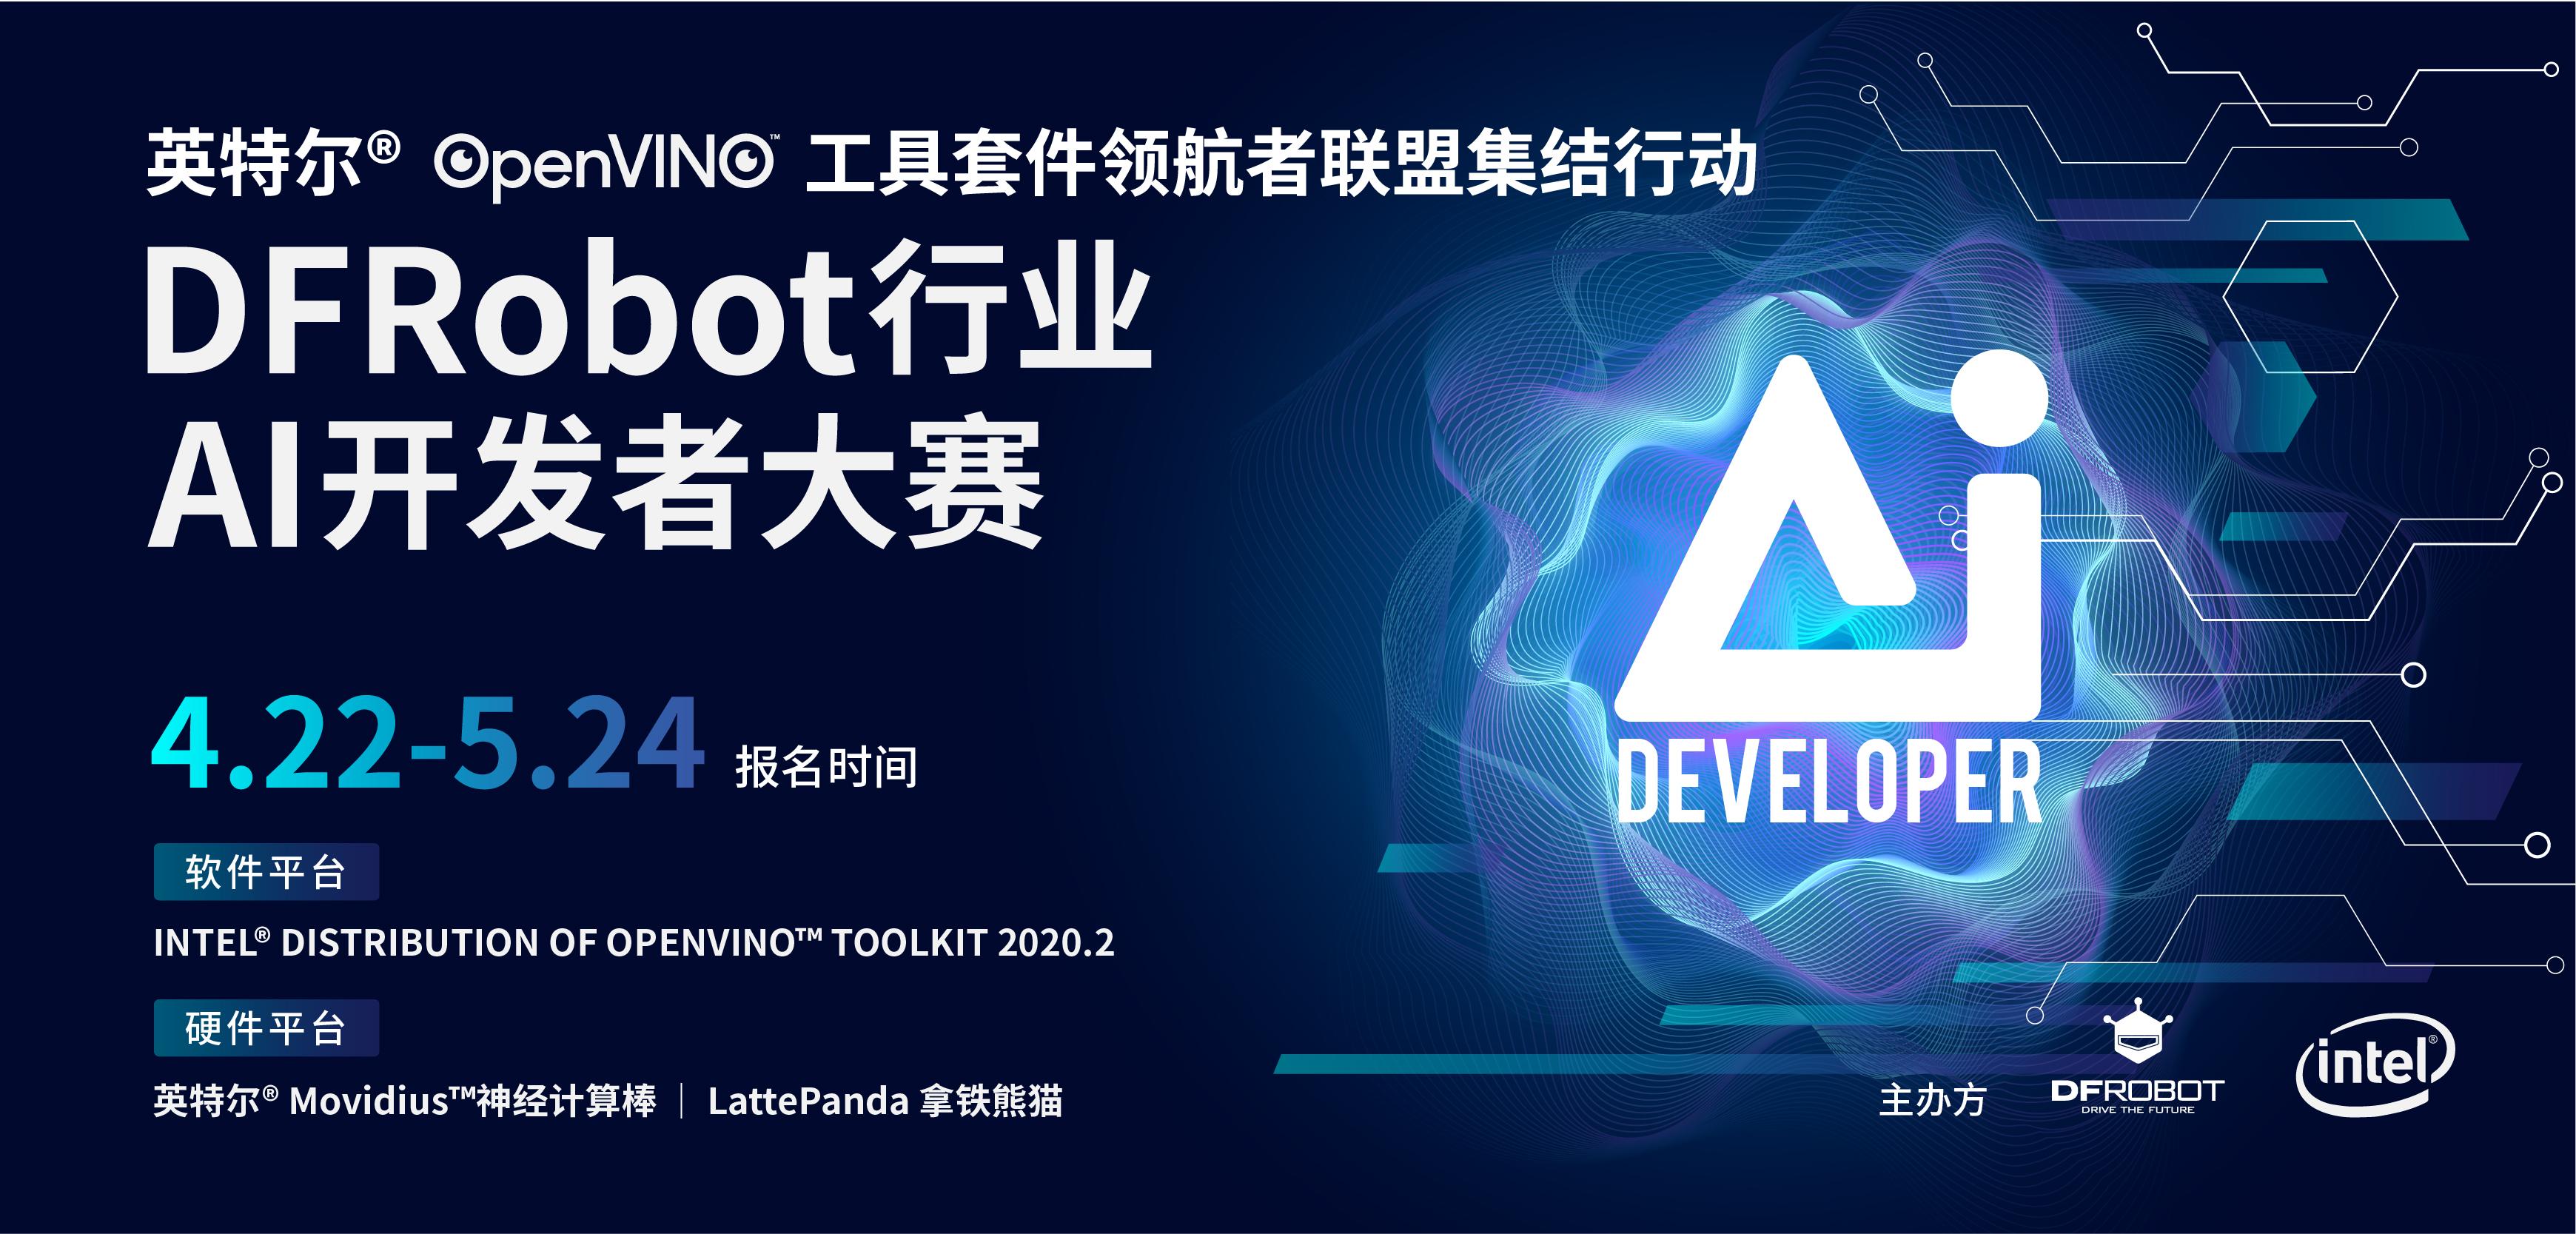 DFRobot最新创客活动-英特尔®OpenVINO™领航者联盟 DFRobot行业AI开发者大赛